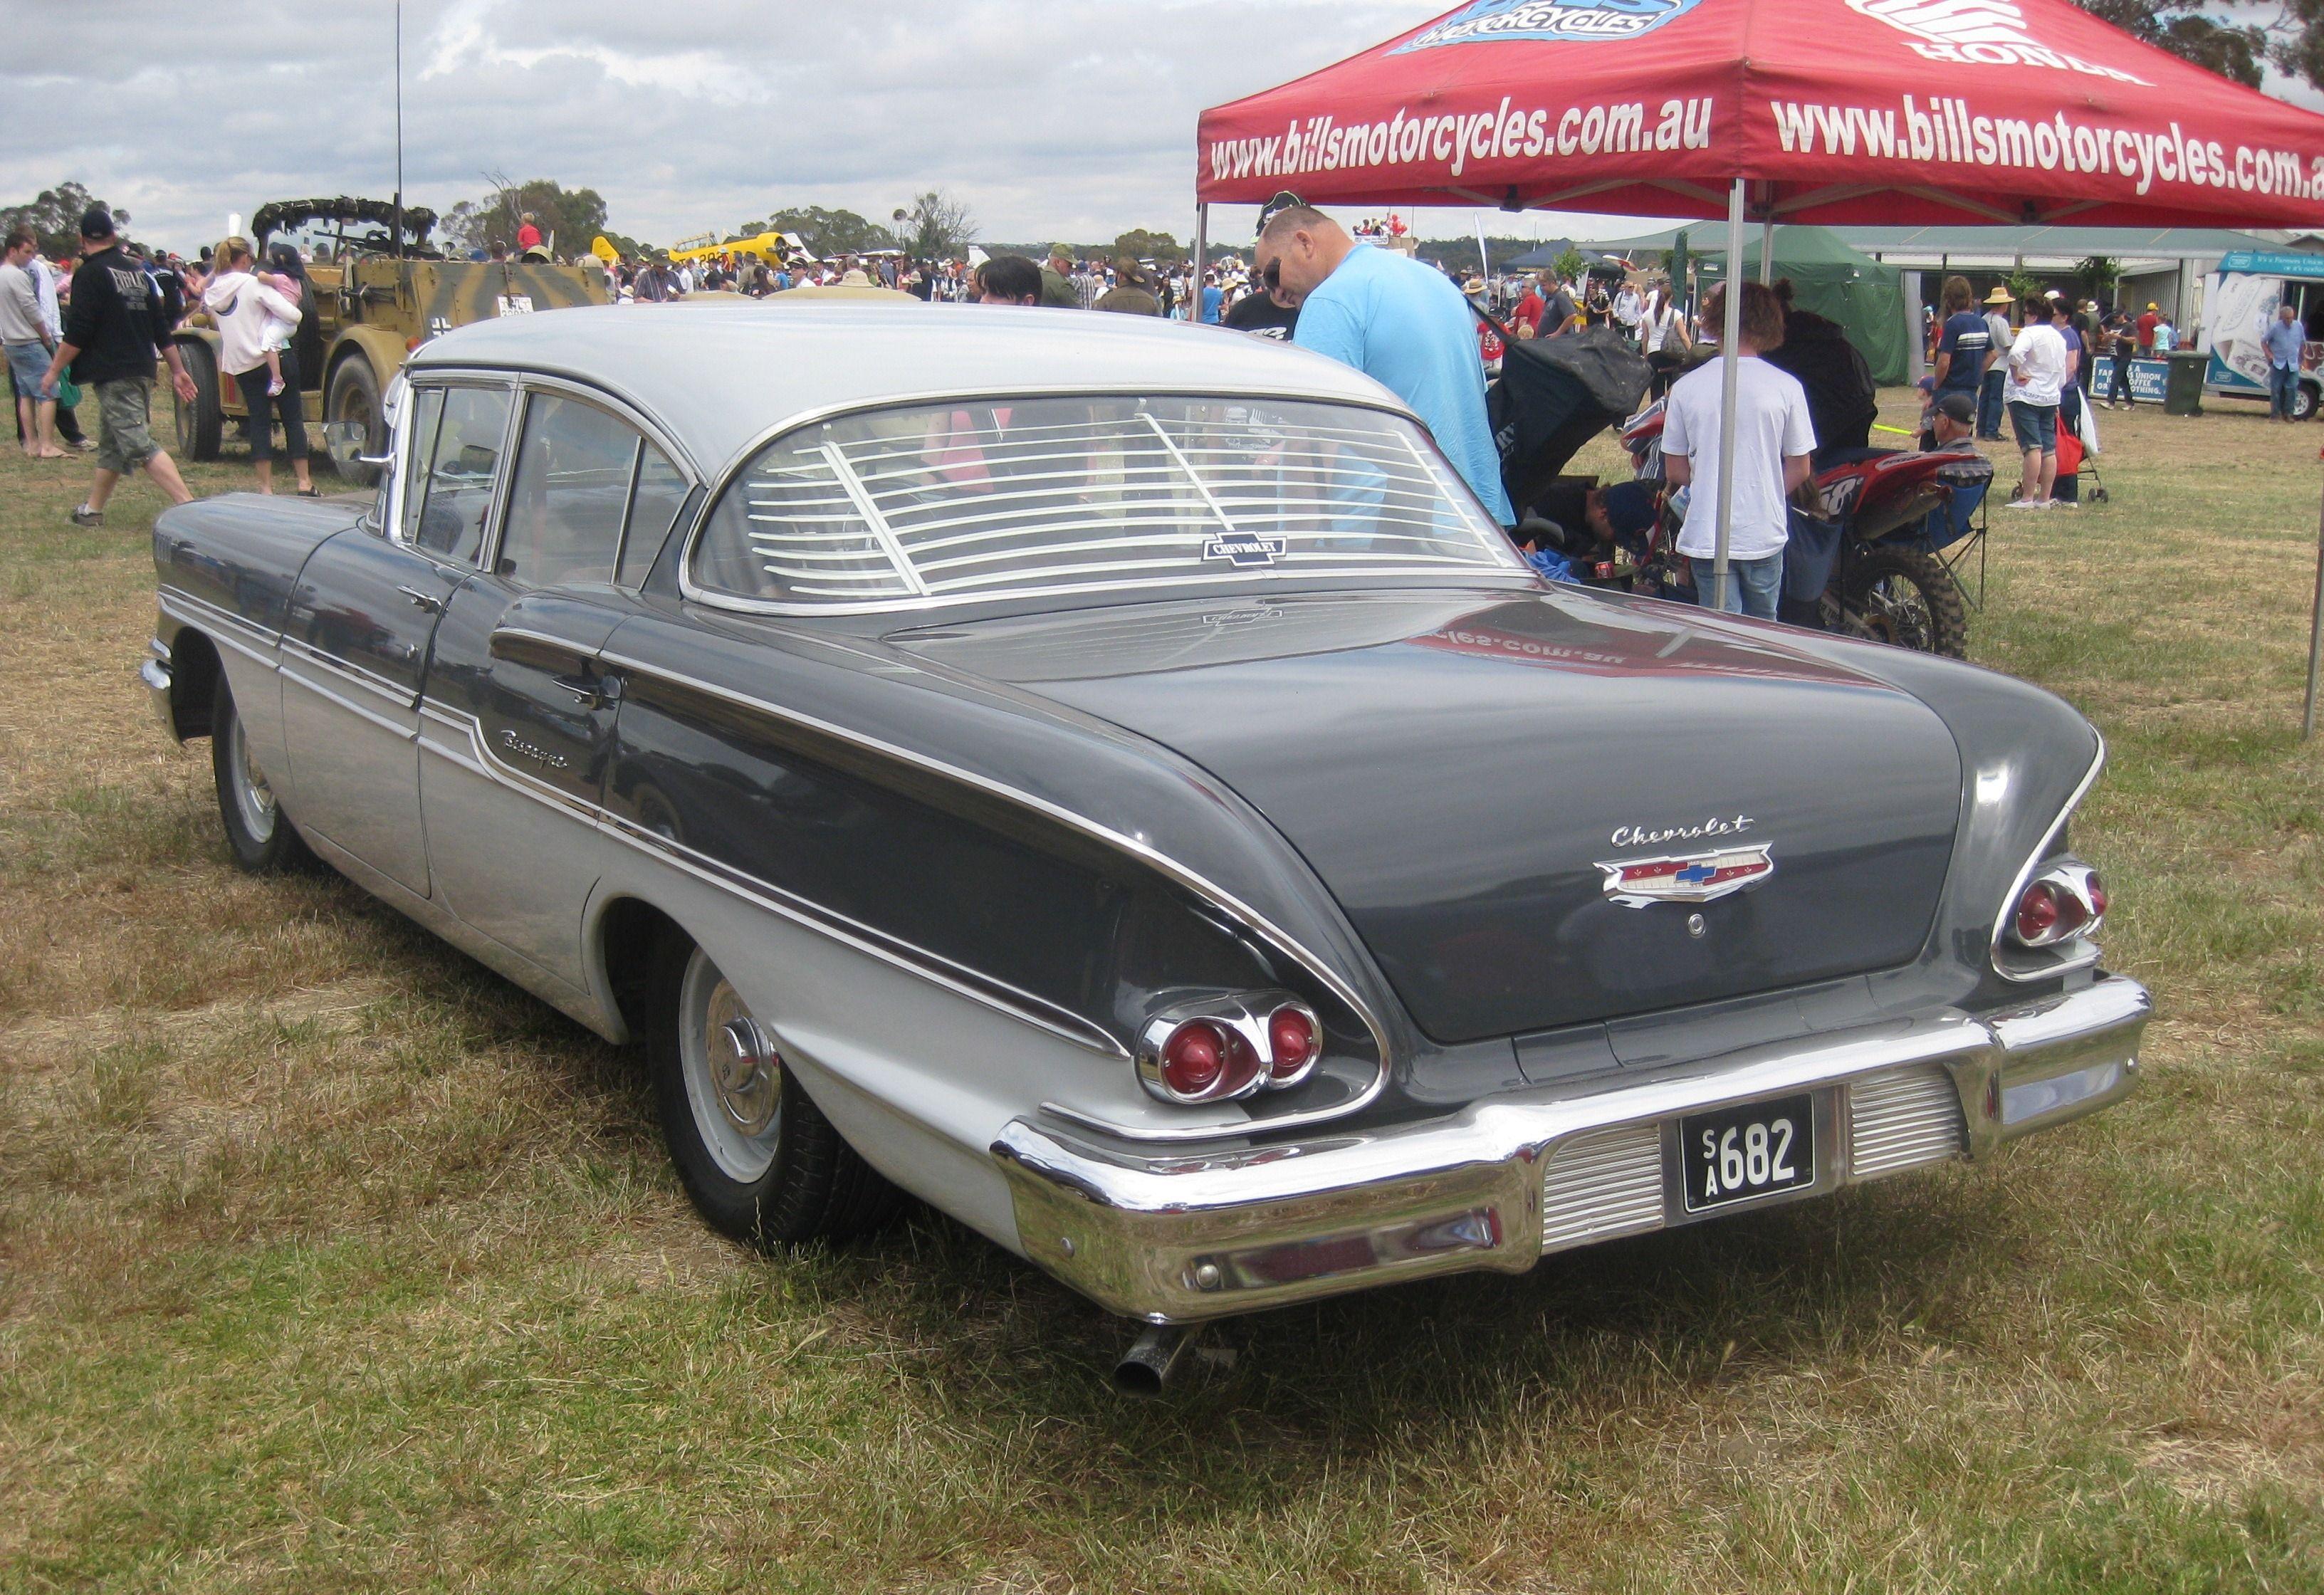 1958 Chevrolet Biscayne | Clics! | Pinterest | Chevrolet, Cars ...